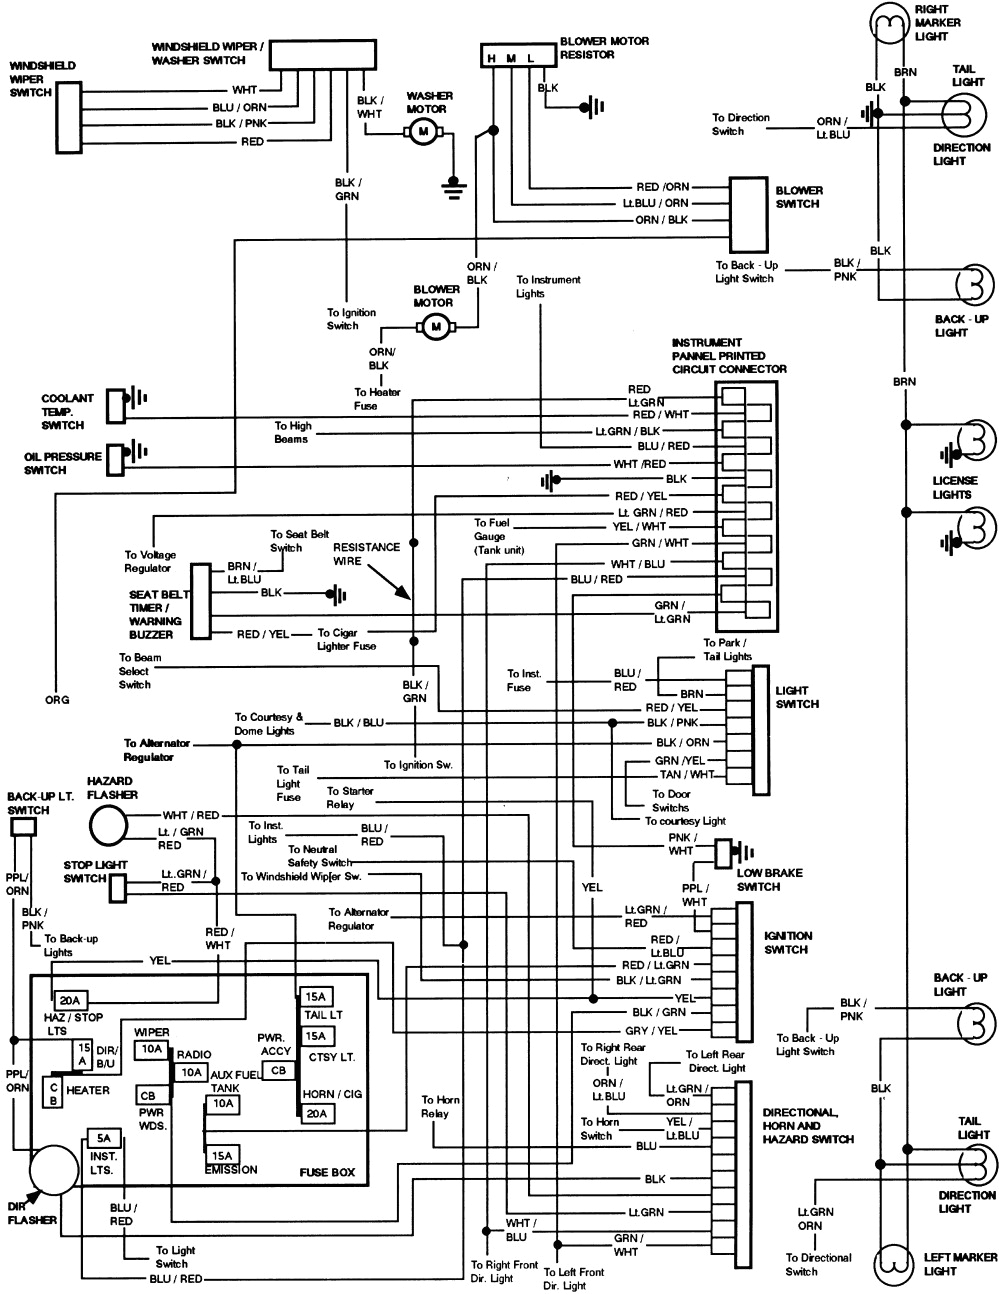 1986 ford F150 Wiring Diagram 1986 ford Truck Wiring F250 Wiring Diagram Blog